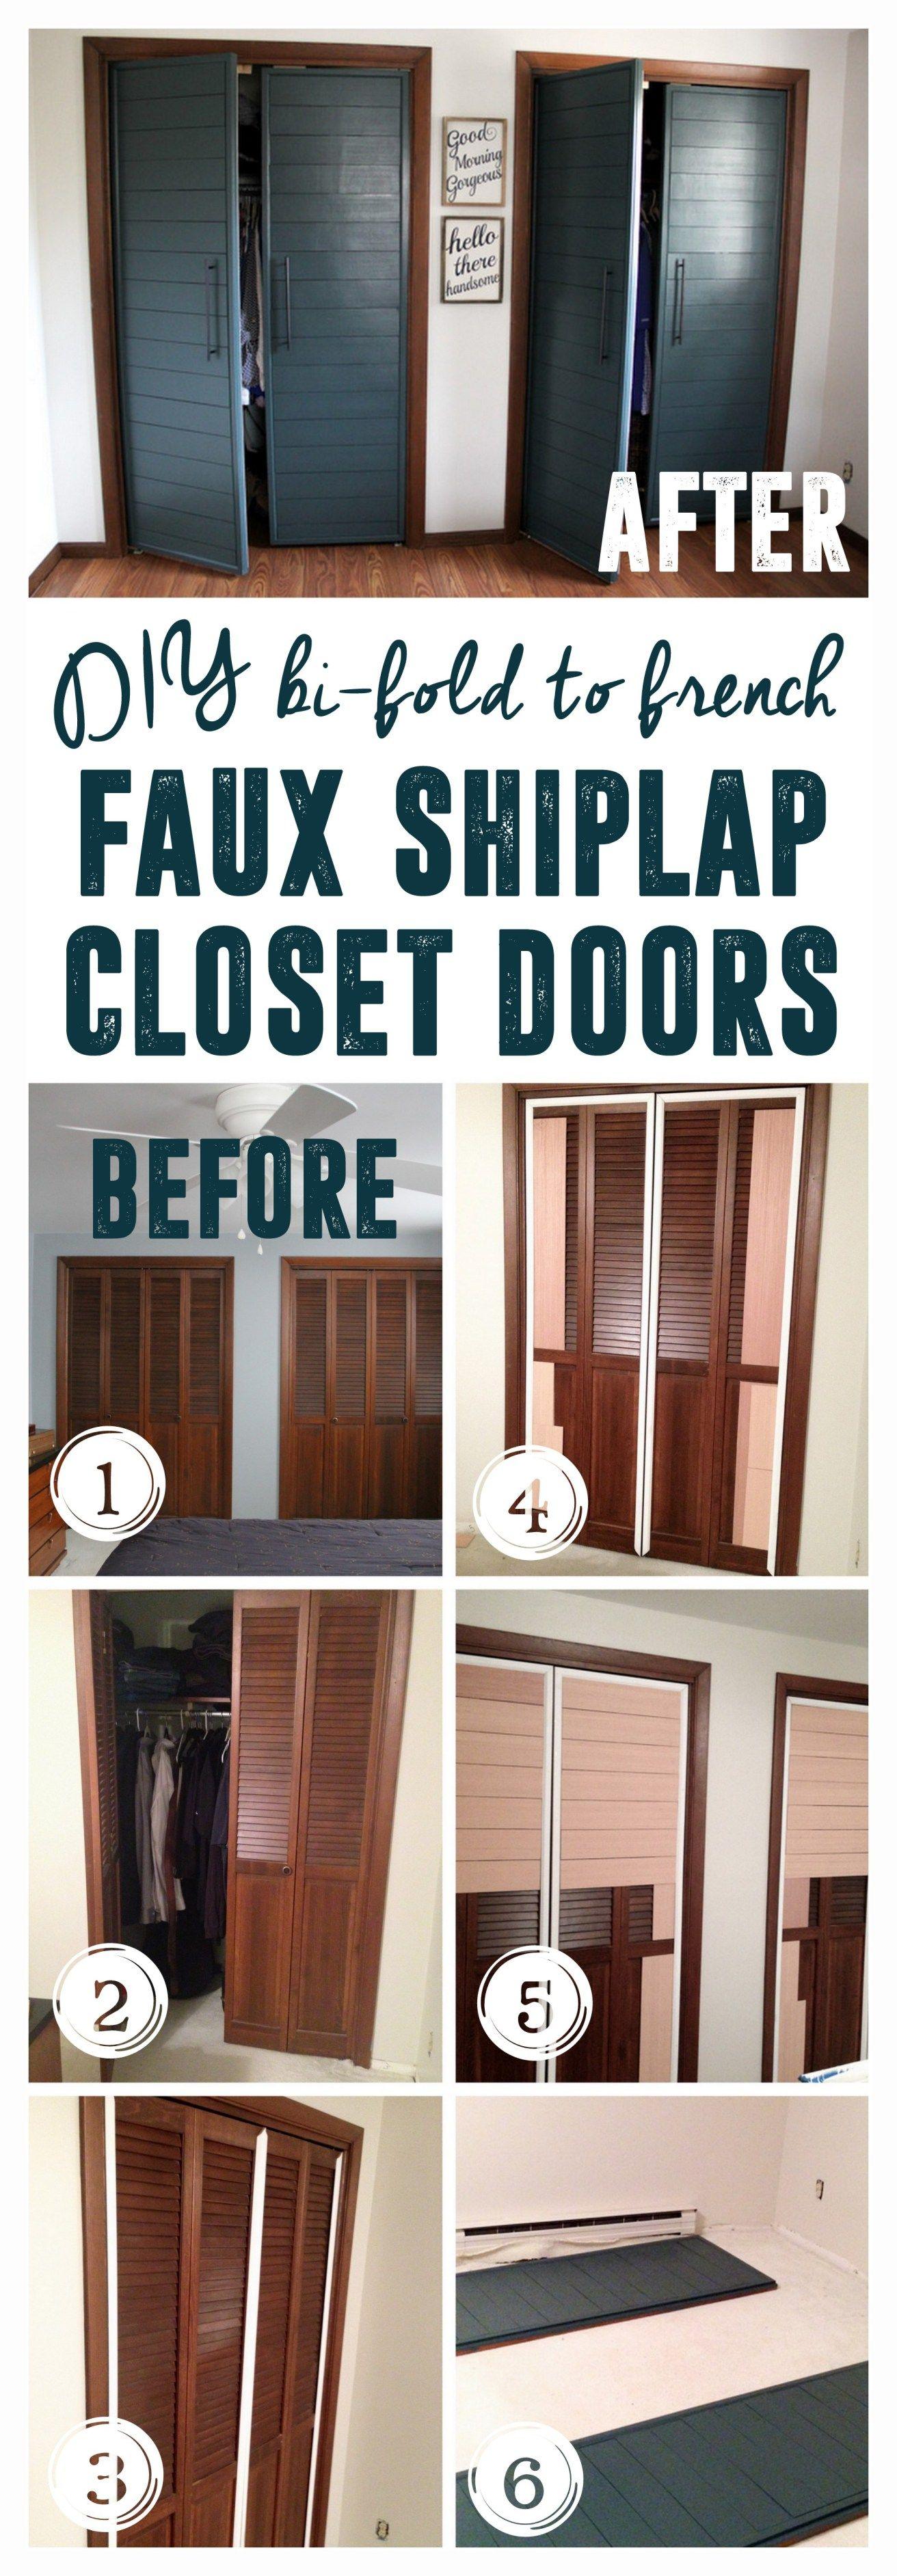 DIY Faux Shiplap French Closet Doors